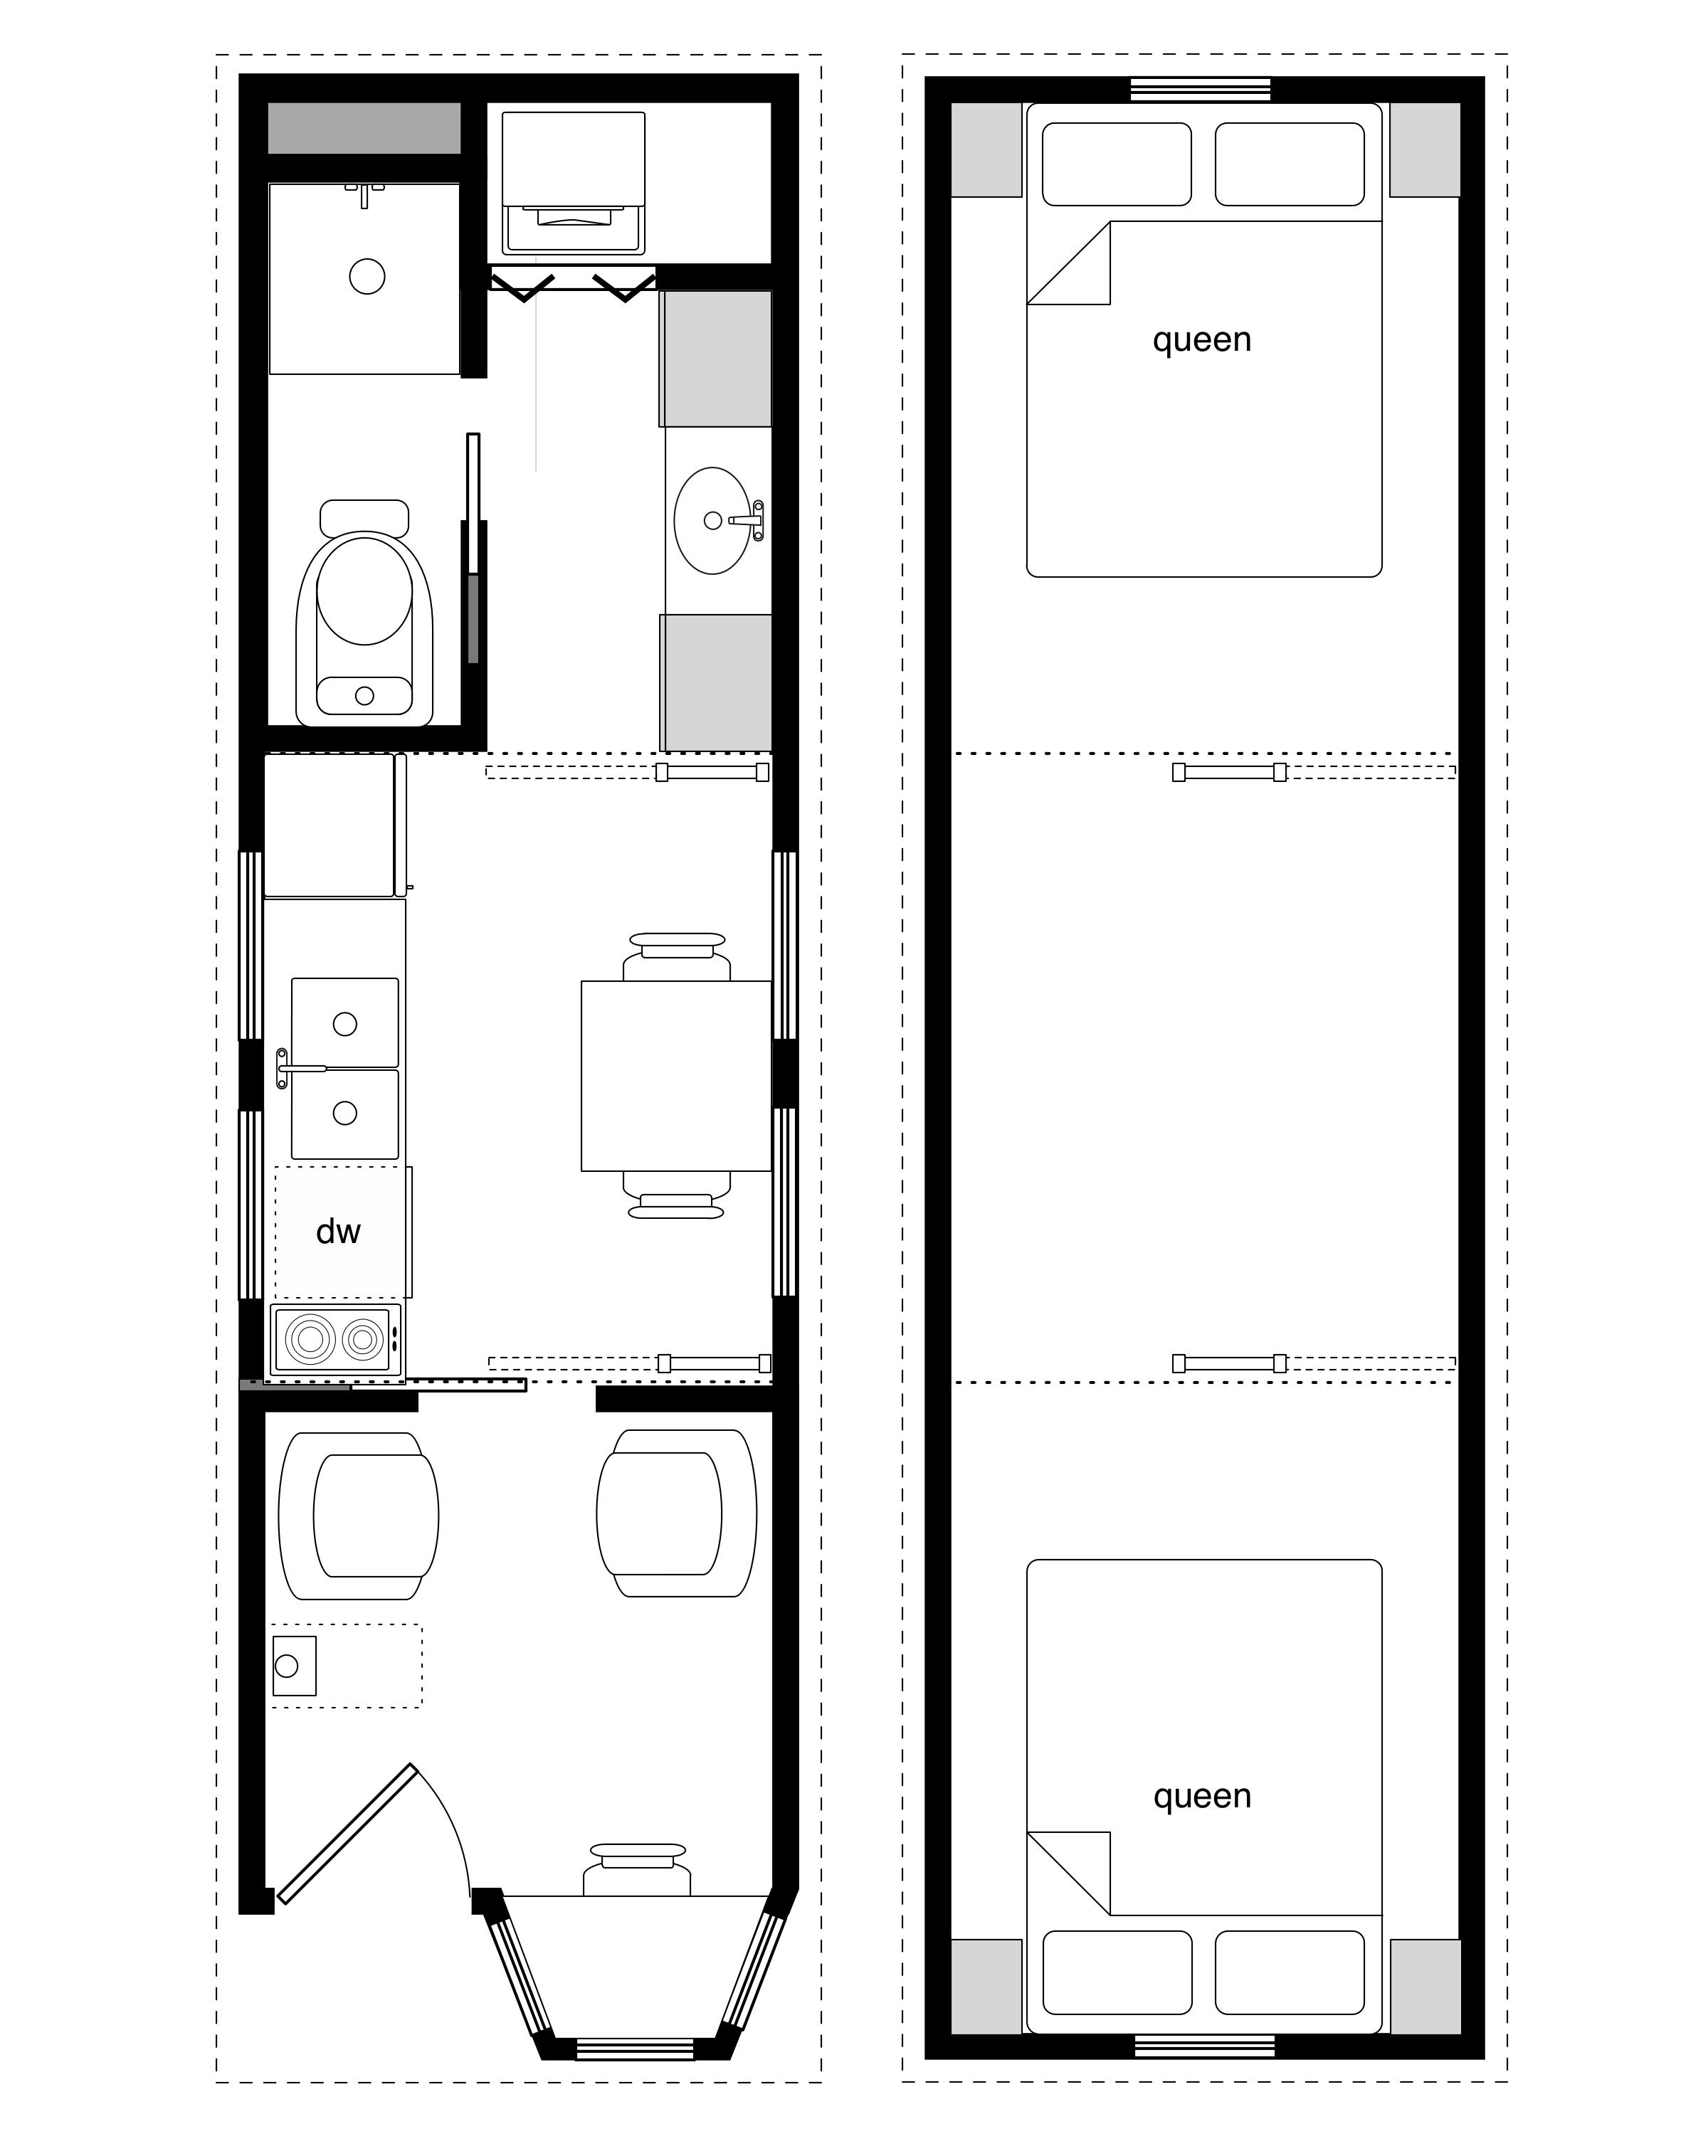 2400x3030 Coastal Cottage With Bay Window 8' X 28' Tiny House Framing